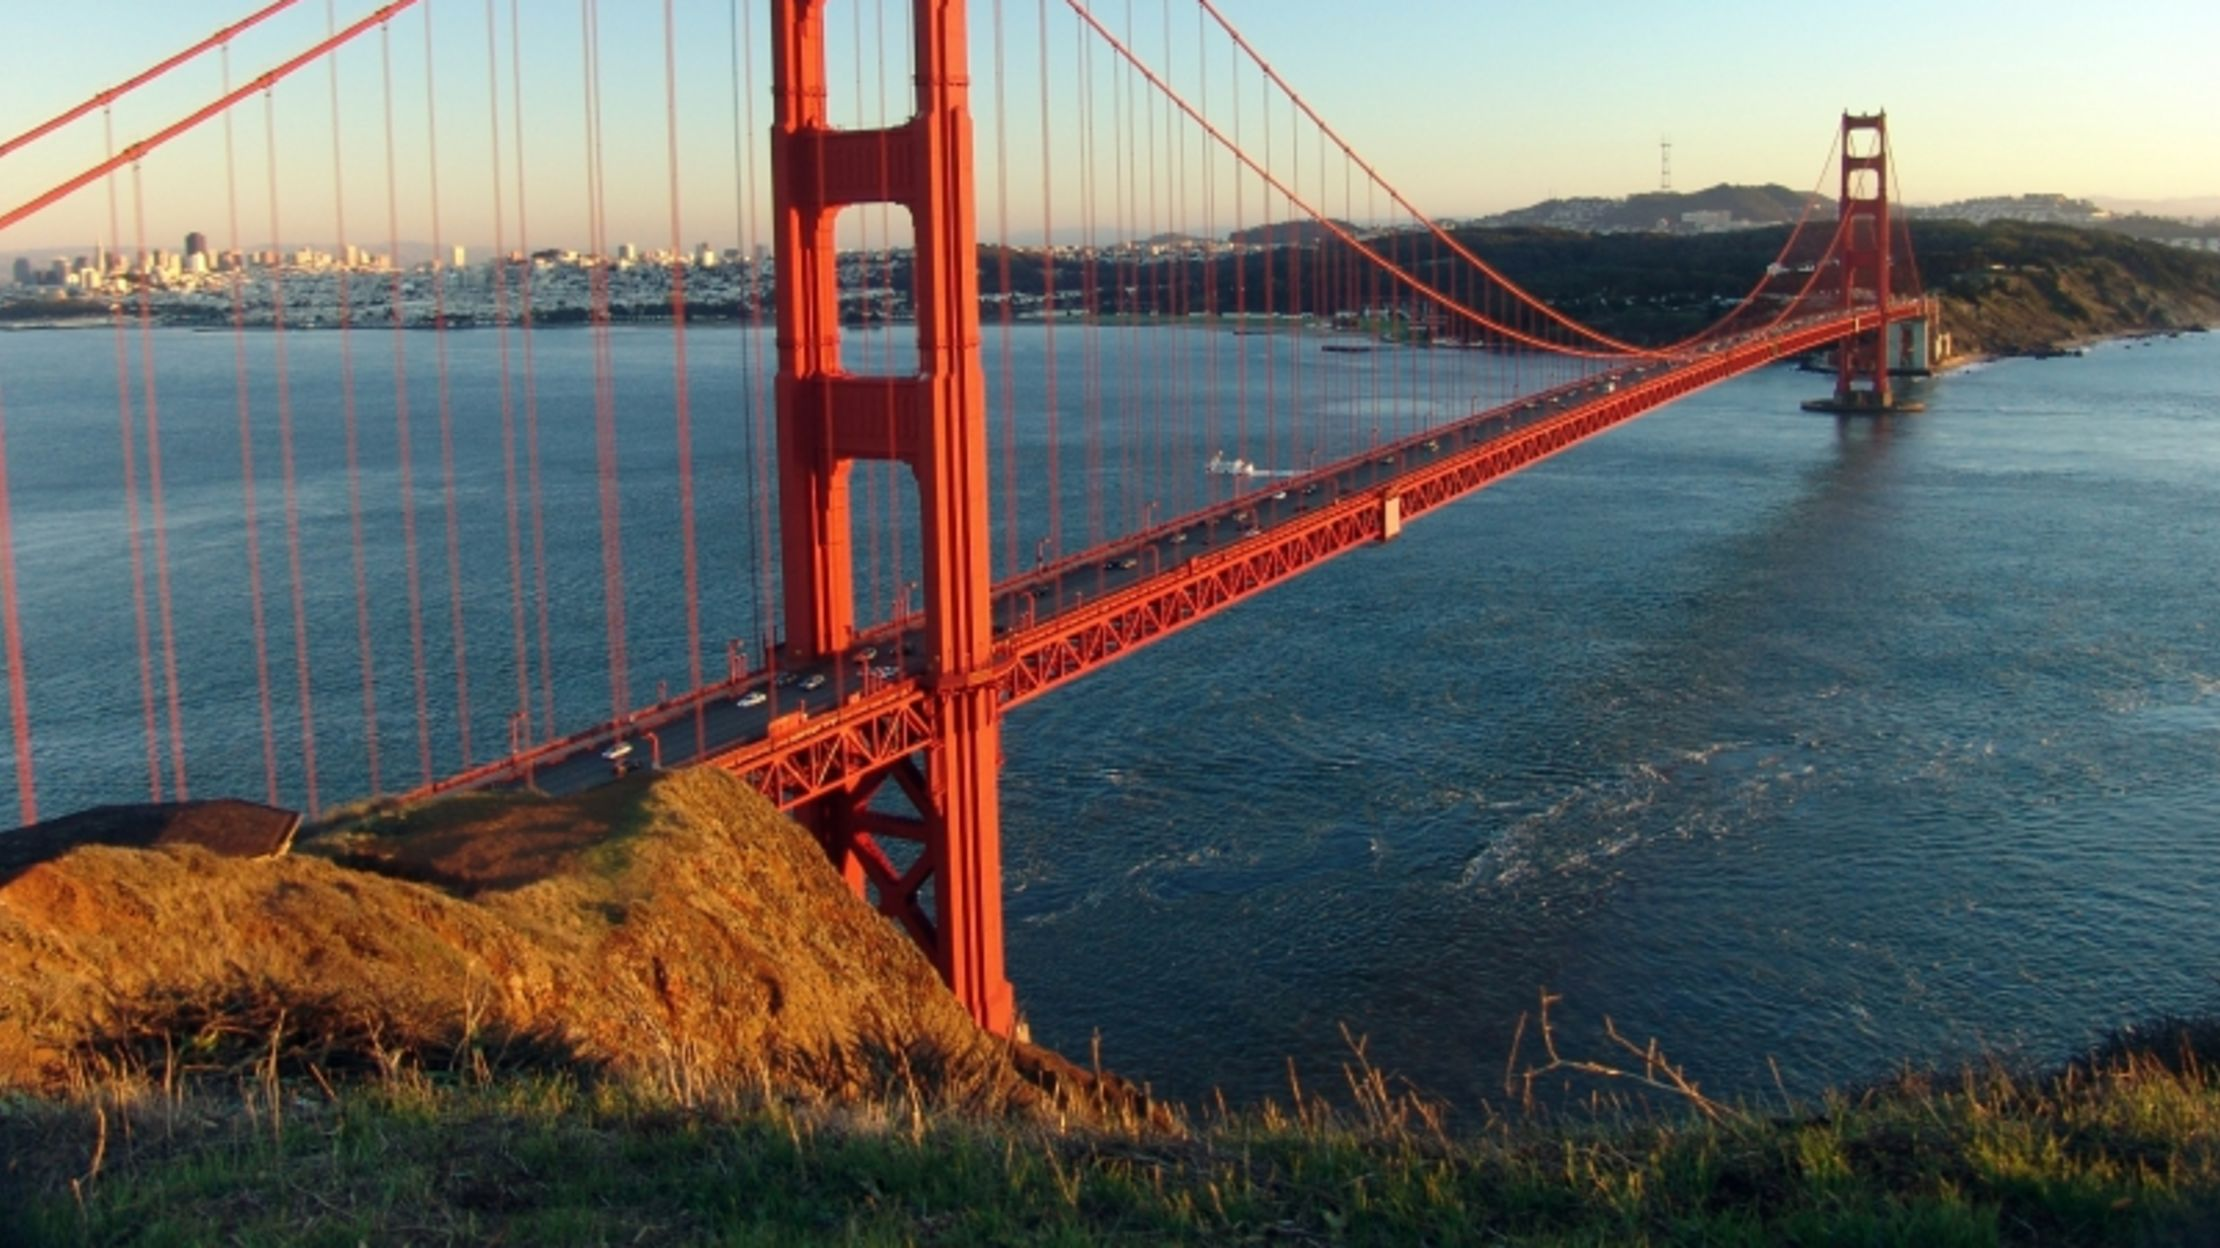 Golden gate bridge images